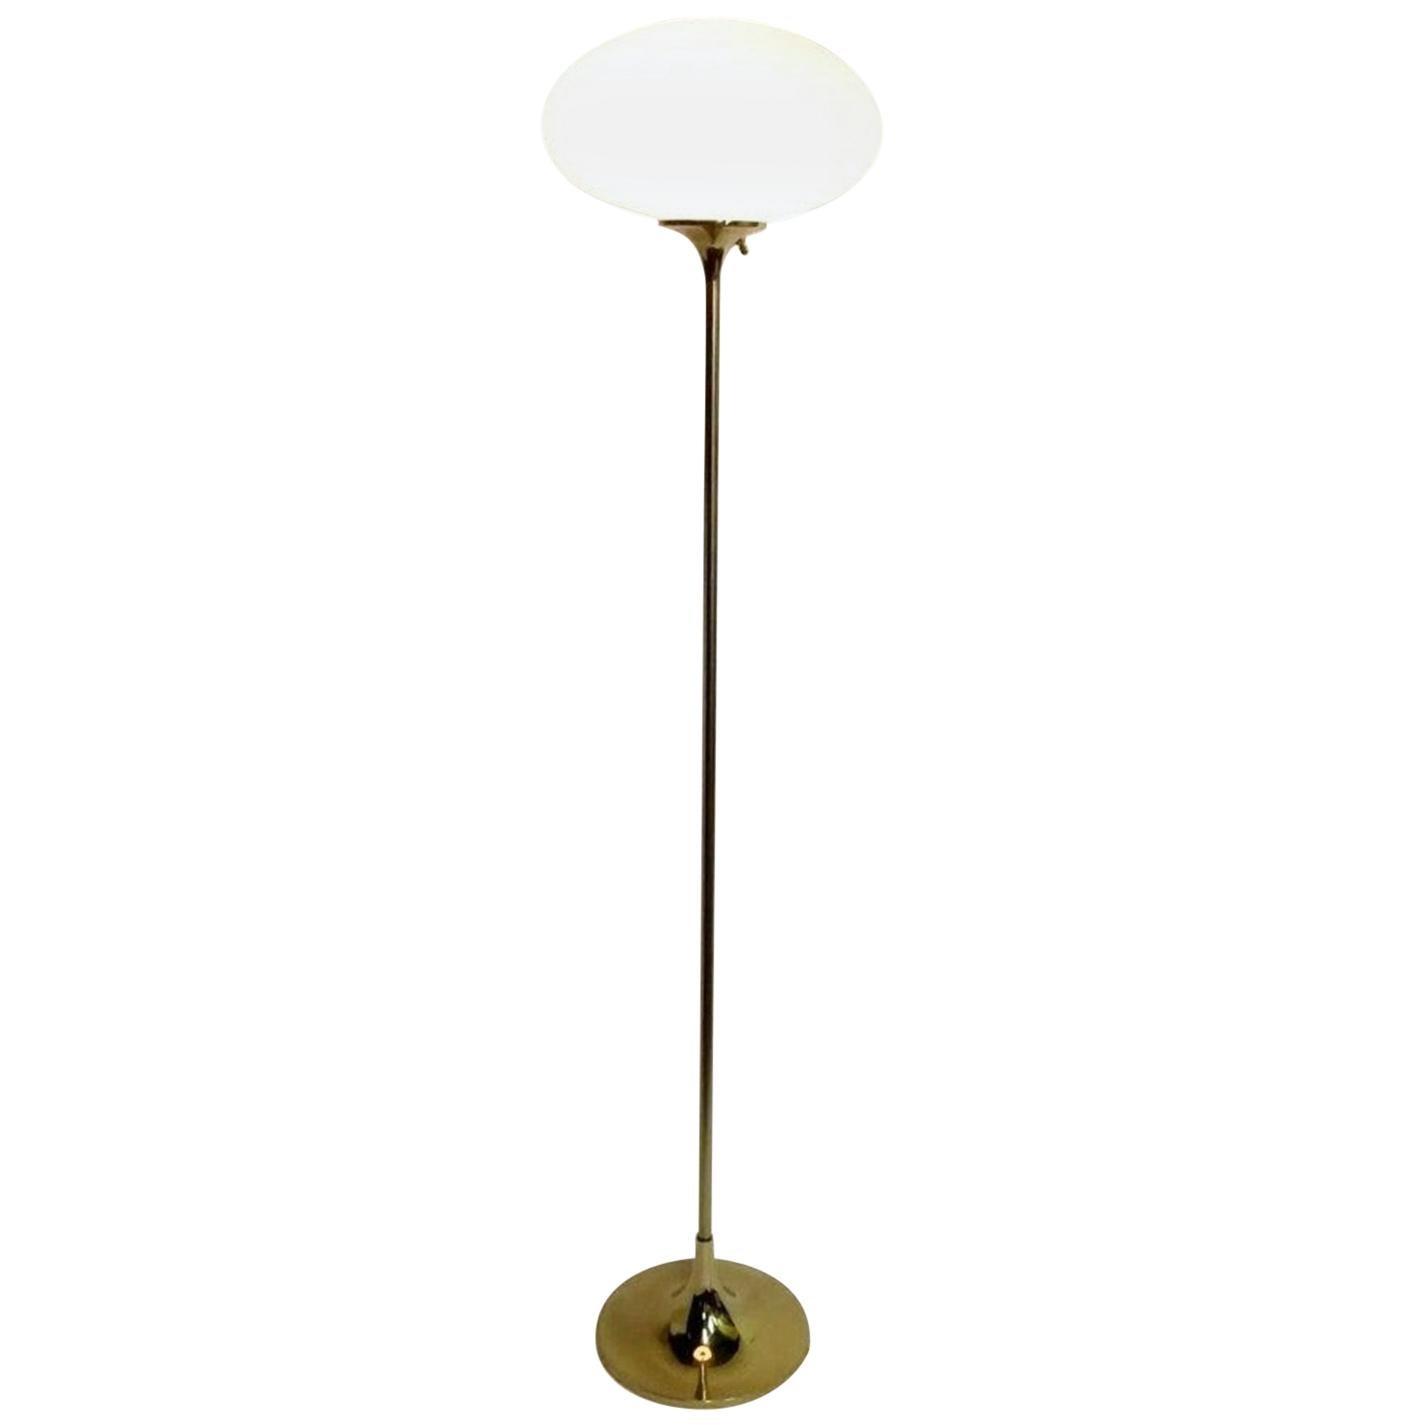 Laurel Mushroom Floor Lamp in Polished Brass